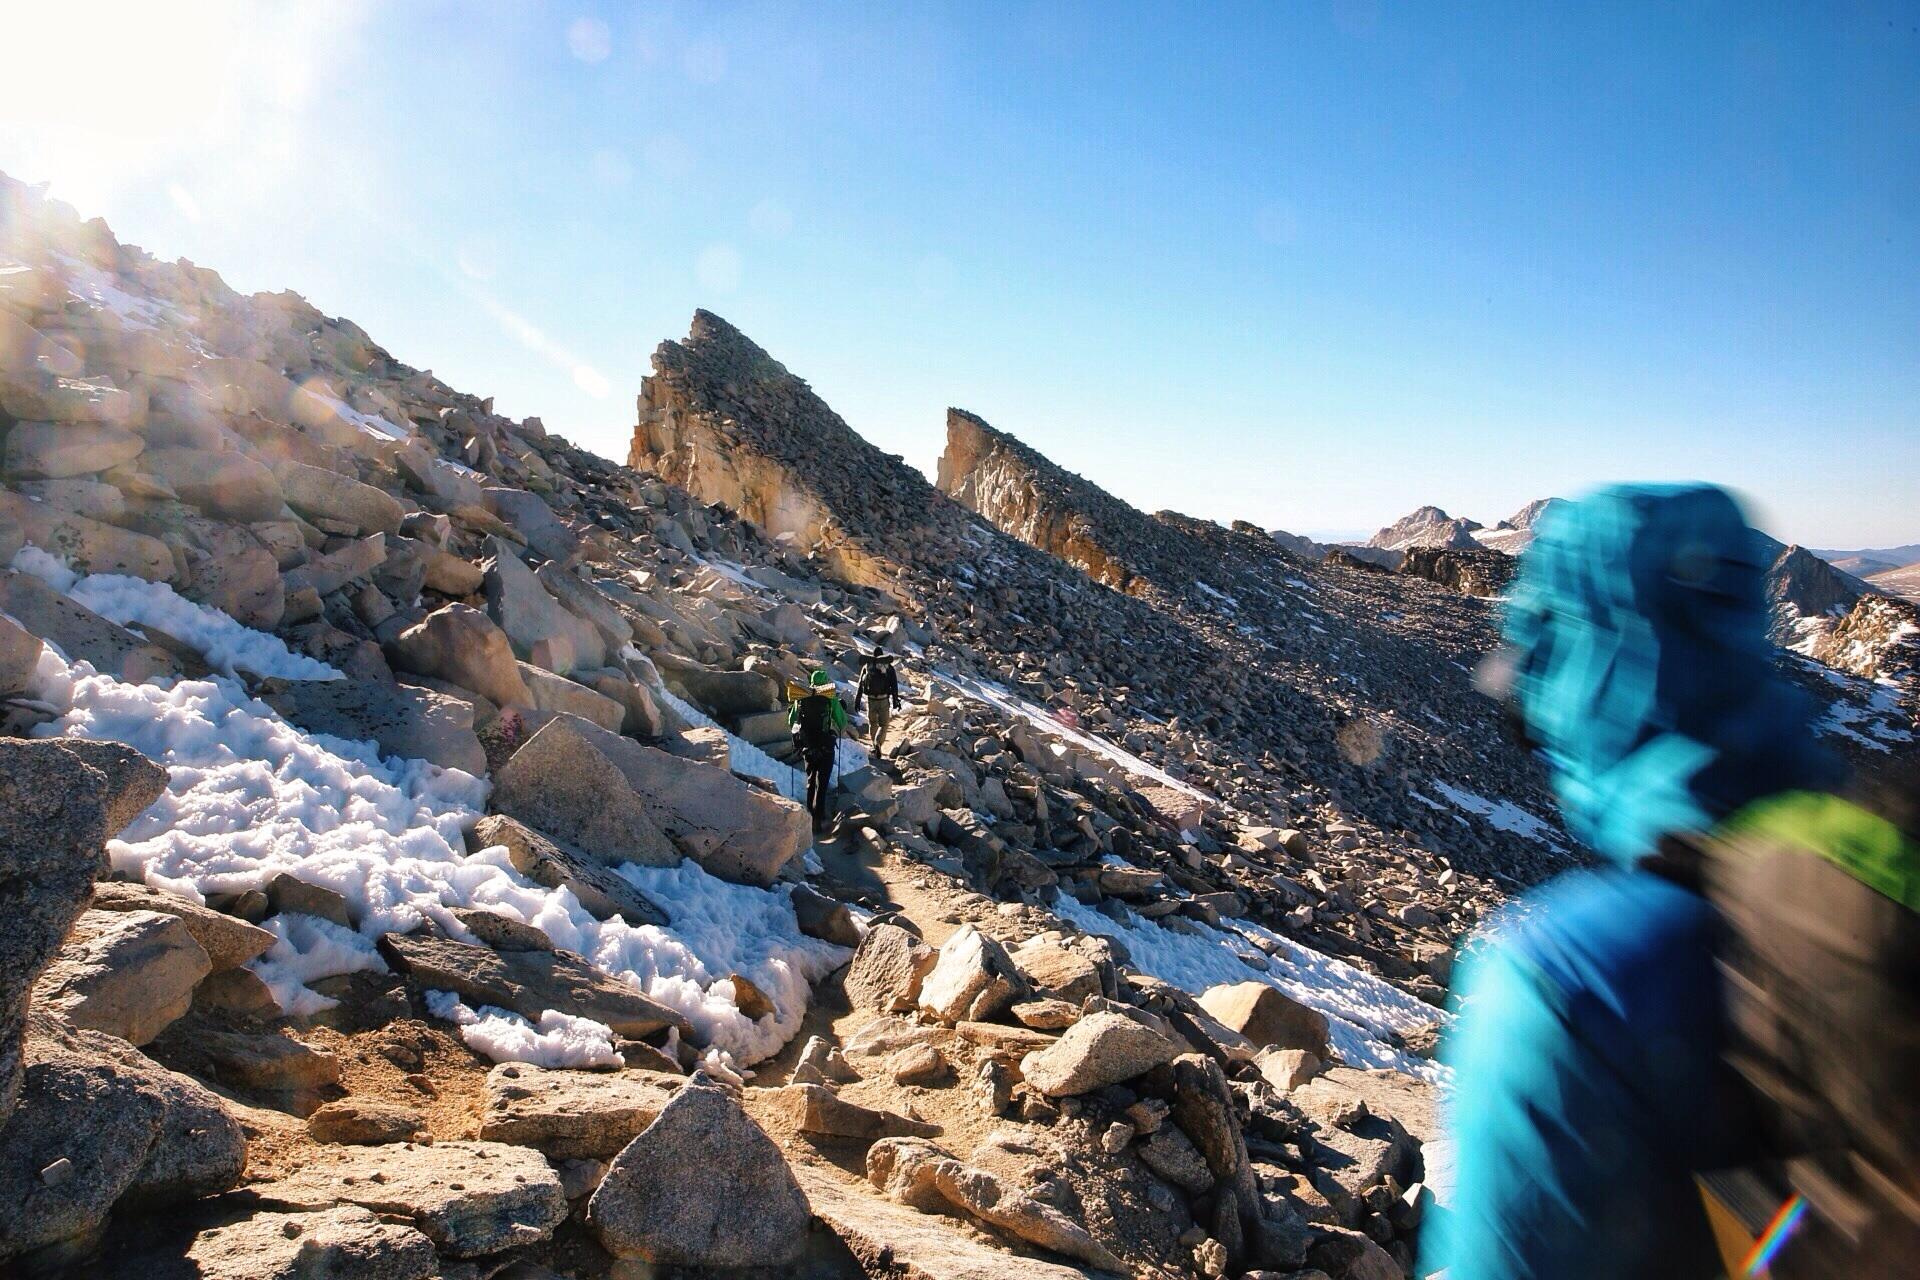 The teeth near the summit.